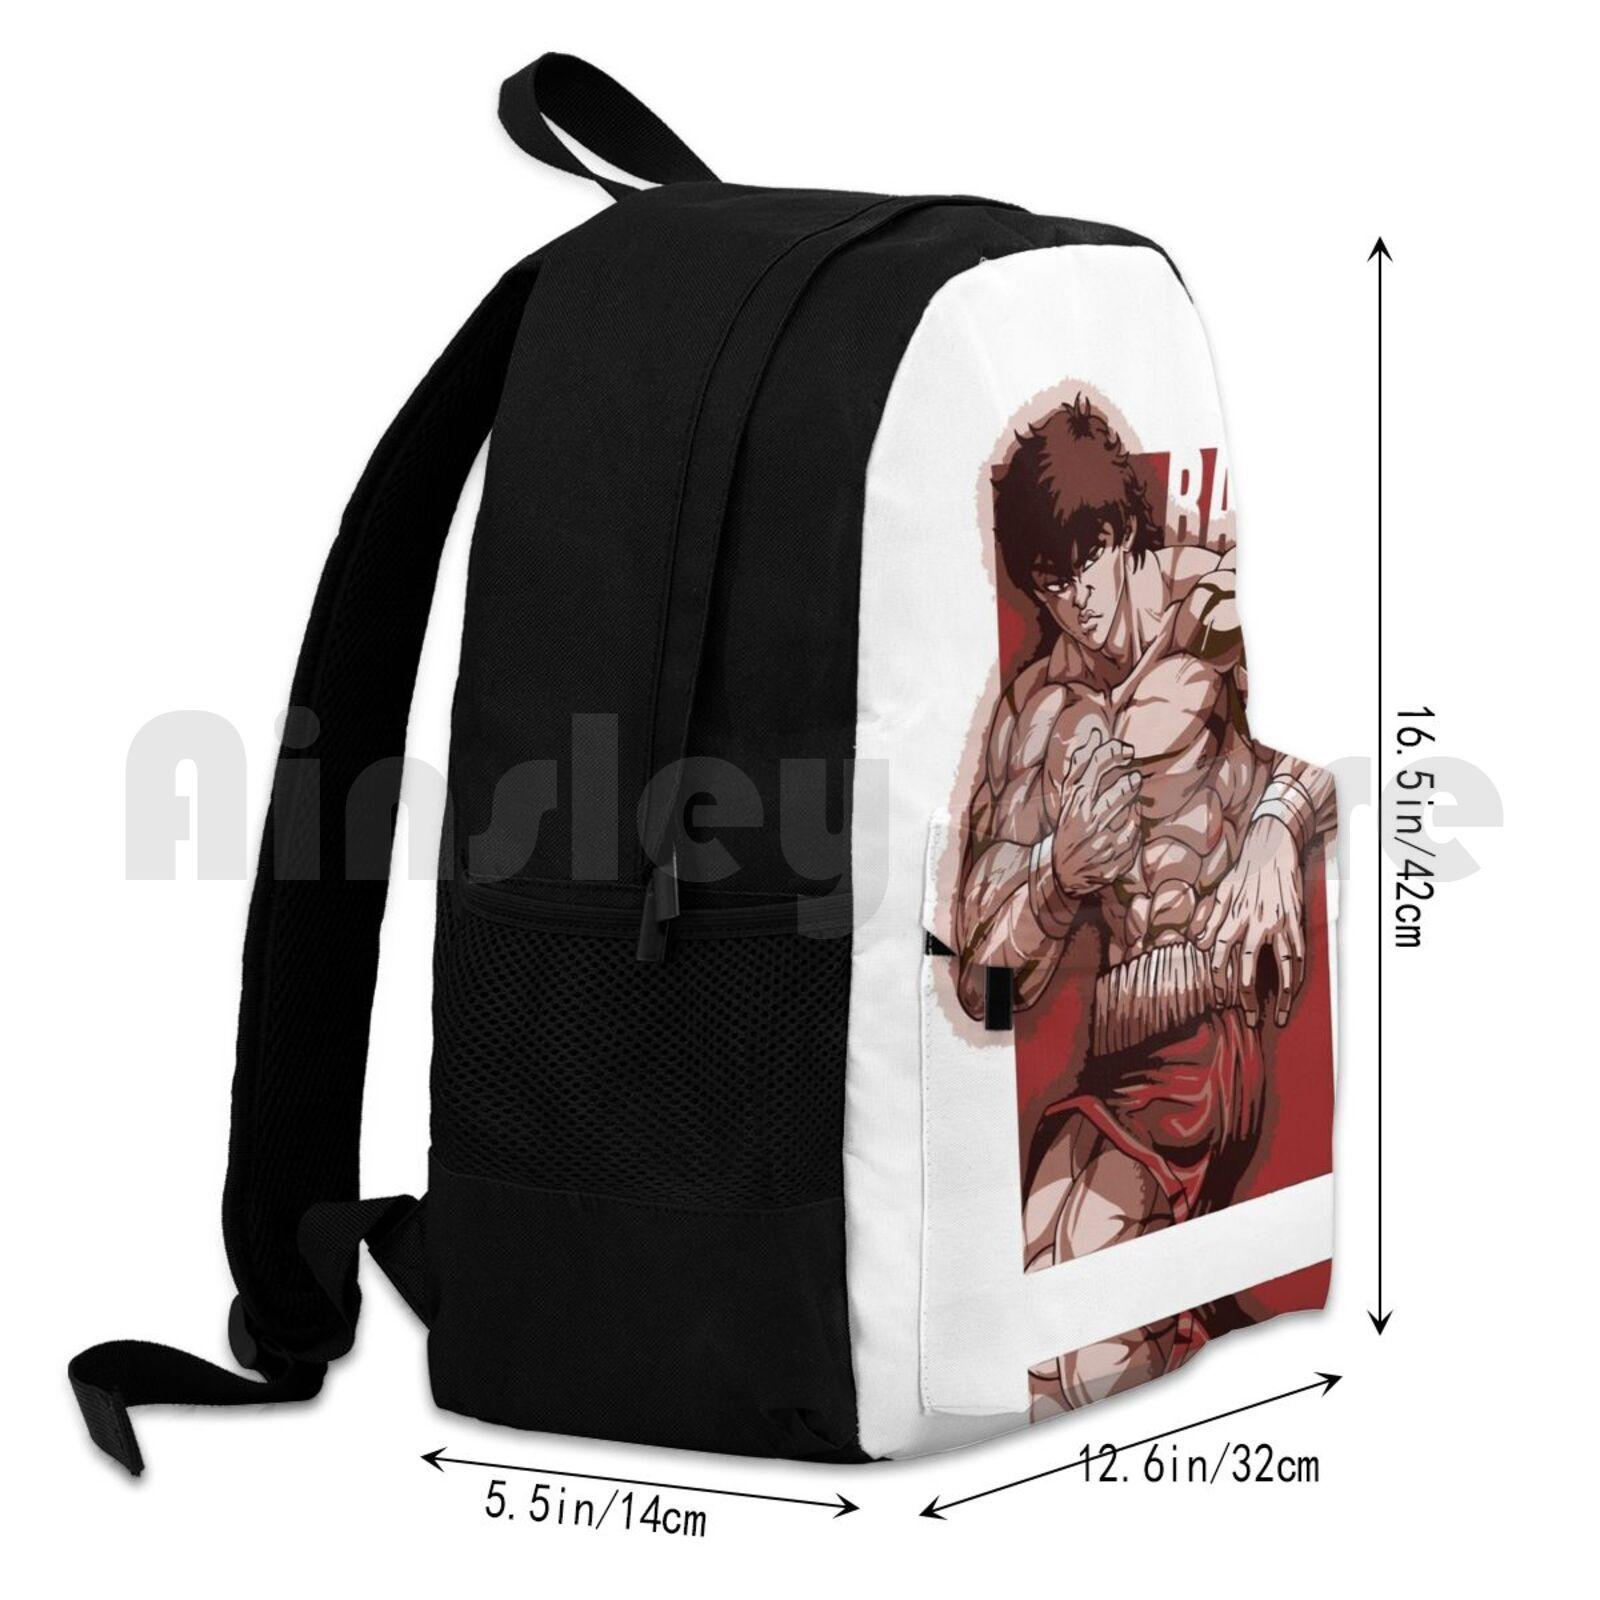 H89389fae077c401c8042458d0cb0f2a4p - Anime Backpacks